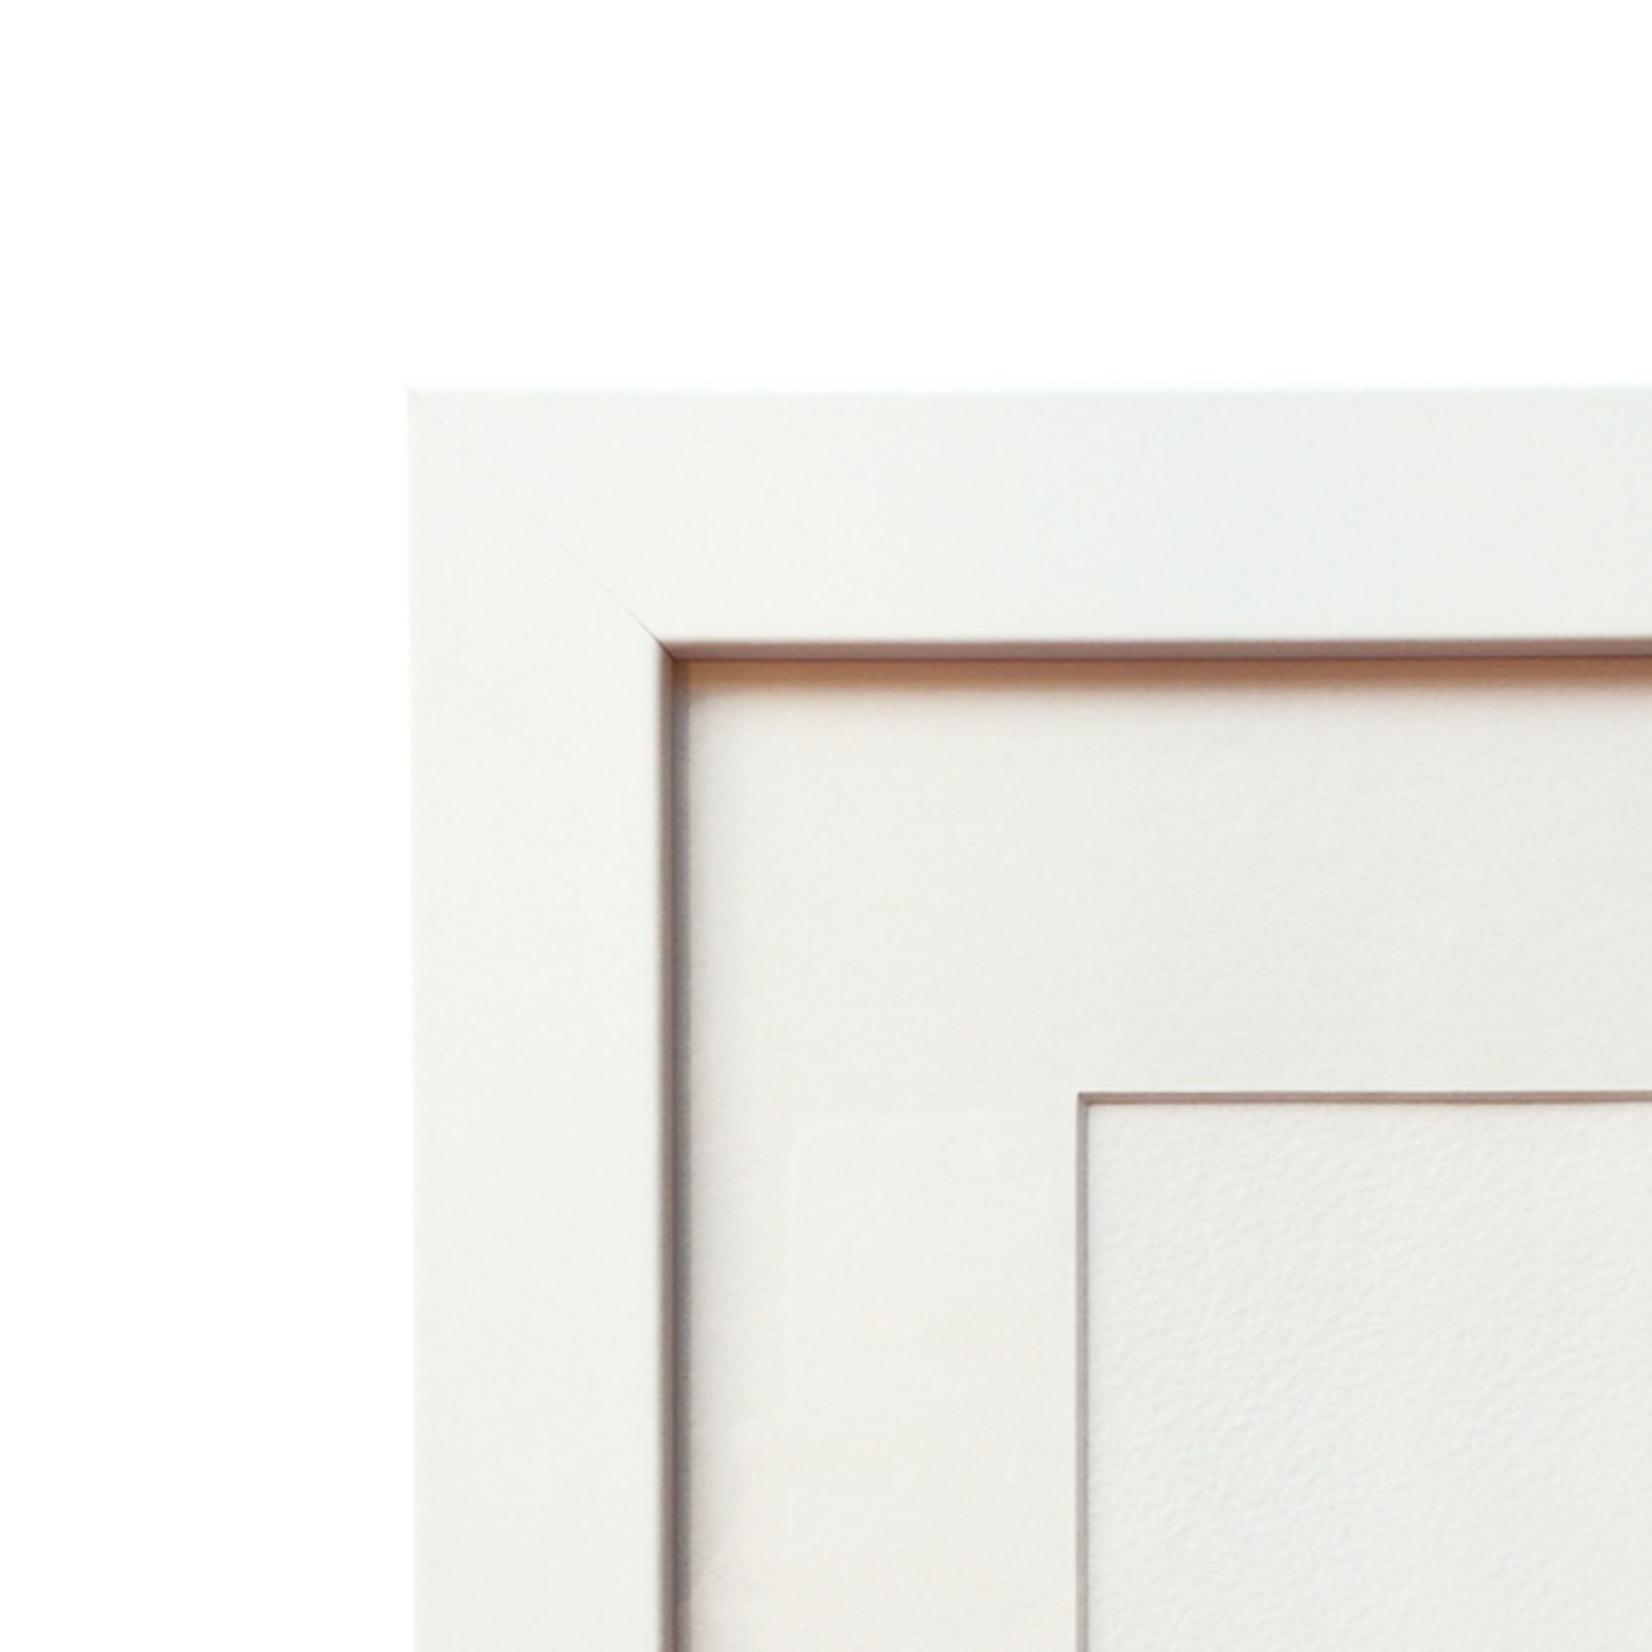 Limited Edition Prints Pinktartica, 2016